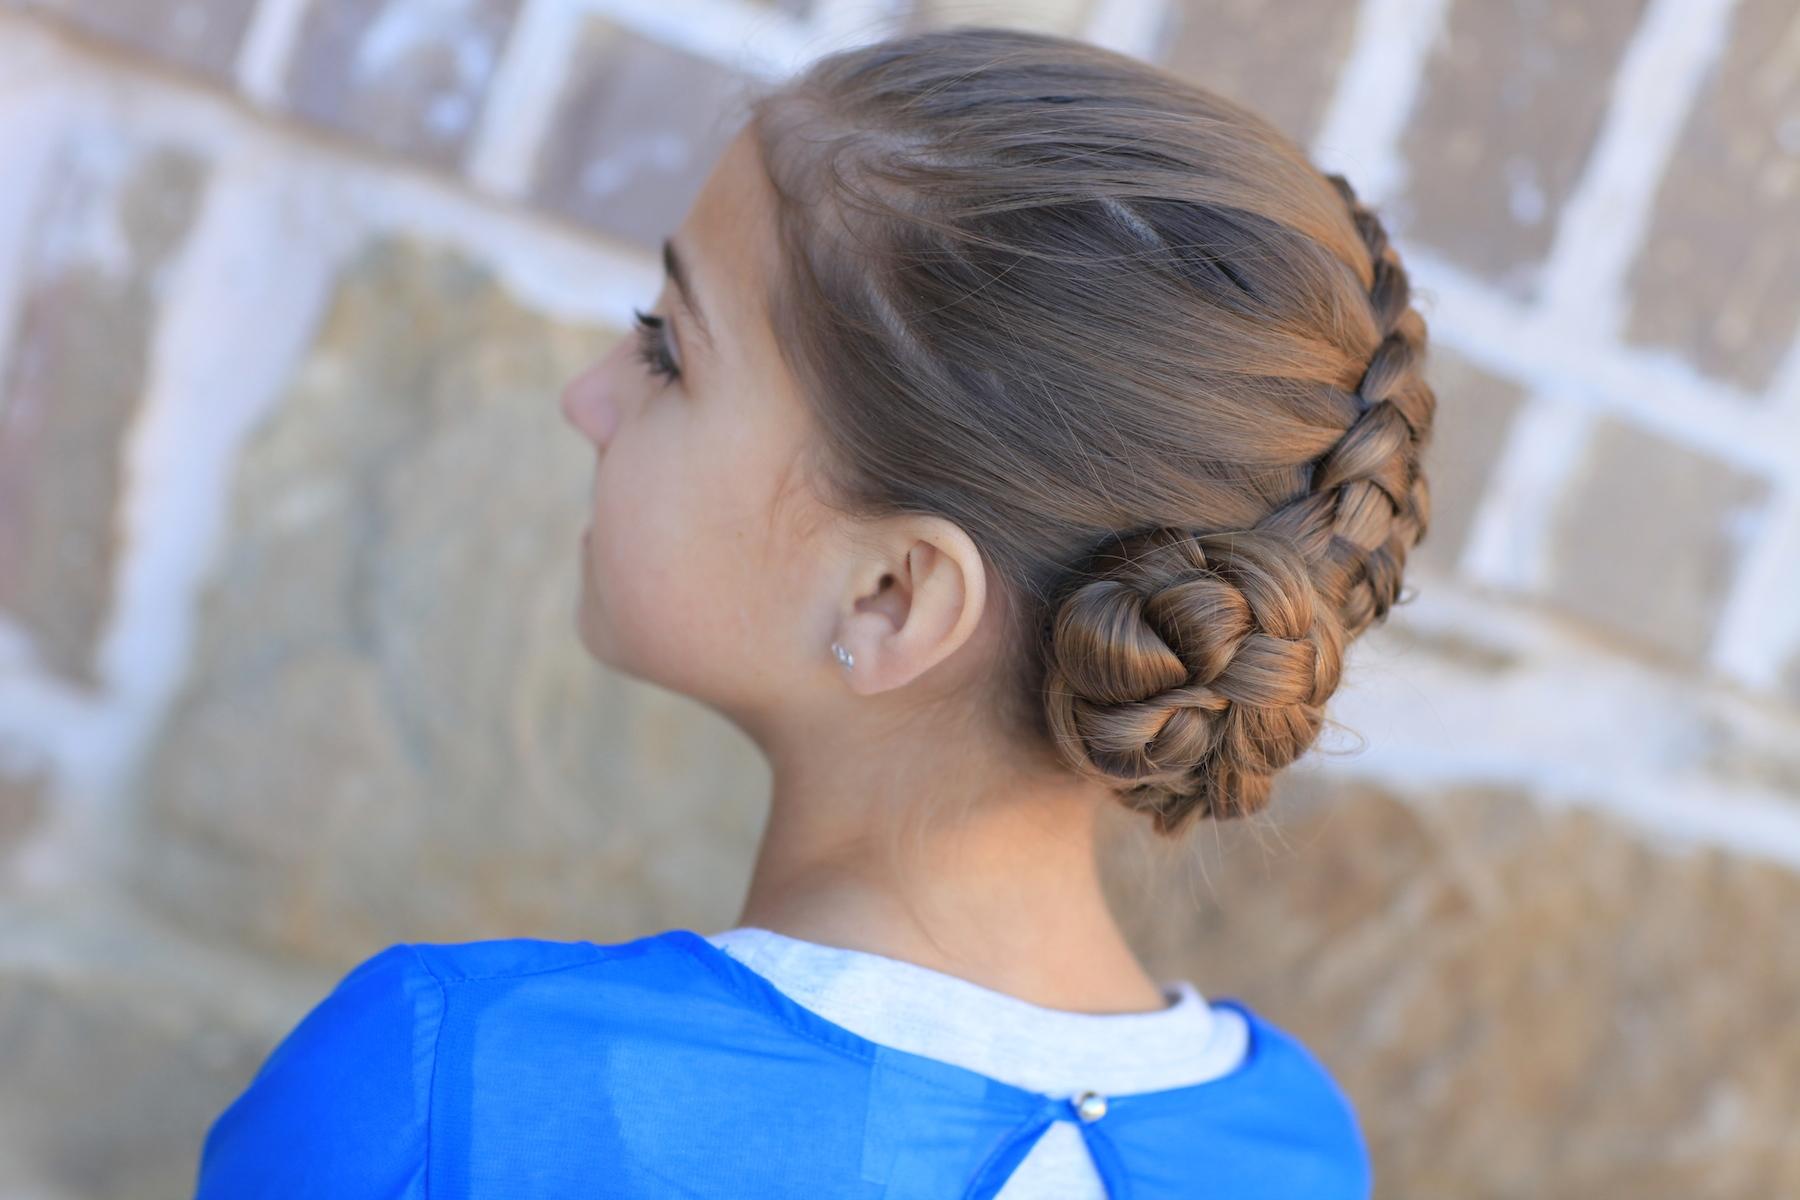 Stupendous How To Create A Zipper Braid Updo Hairstyles Cute Girls Hairstyles Schematic Wiring Diagrams Phreekkolirunnerswayorg